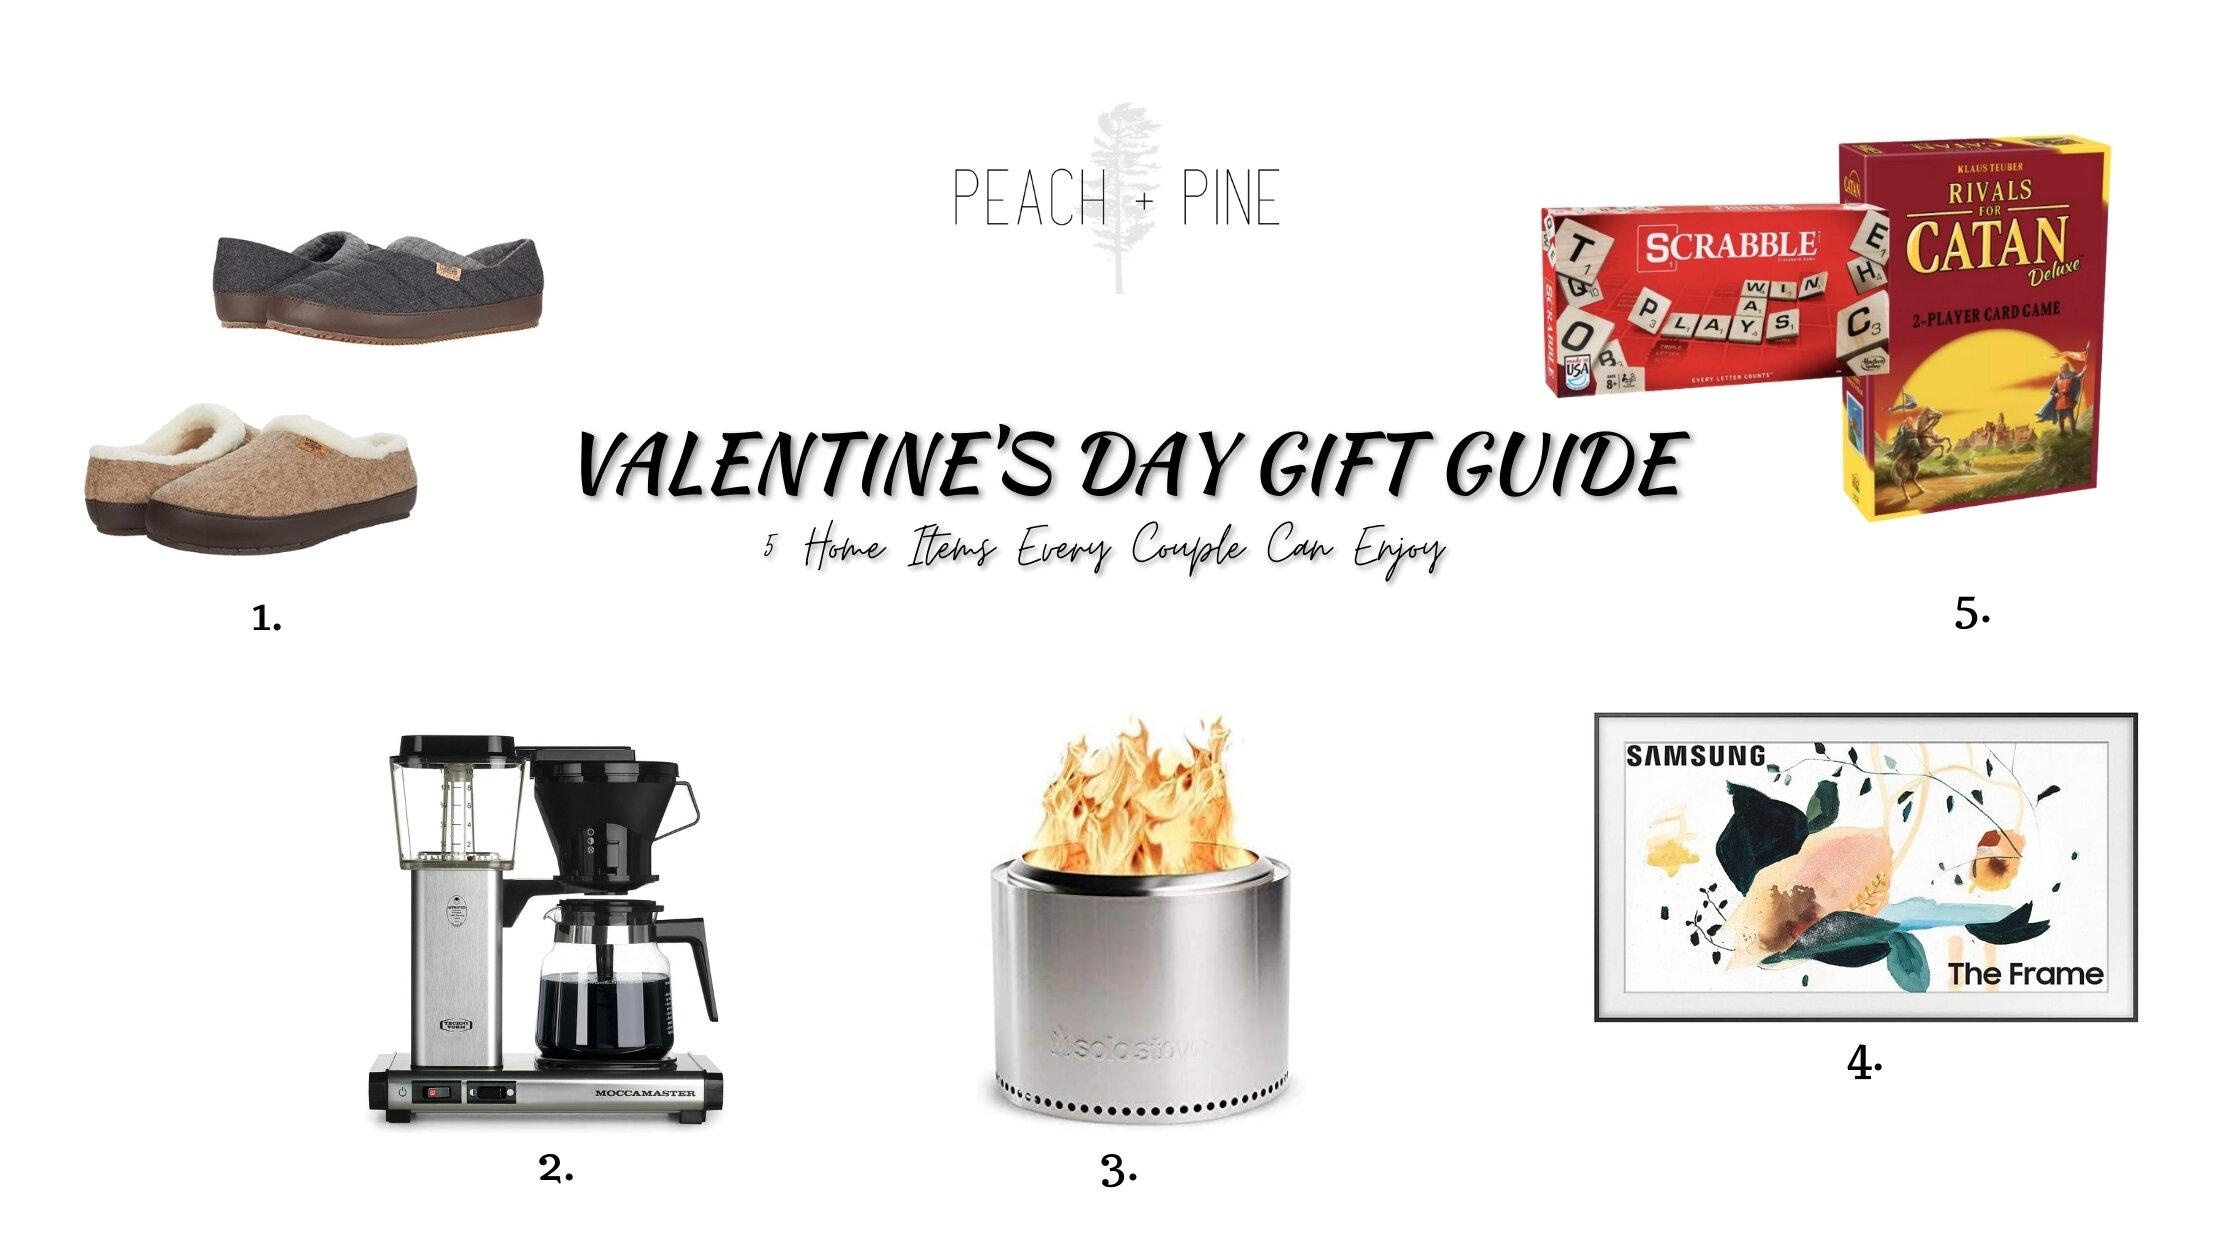 Valentine's Day Gift Guide 2021.jpg